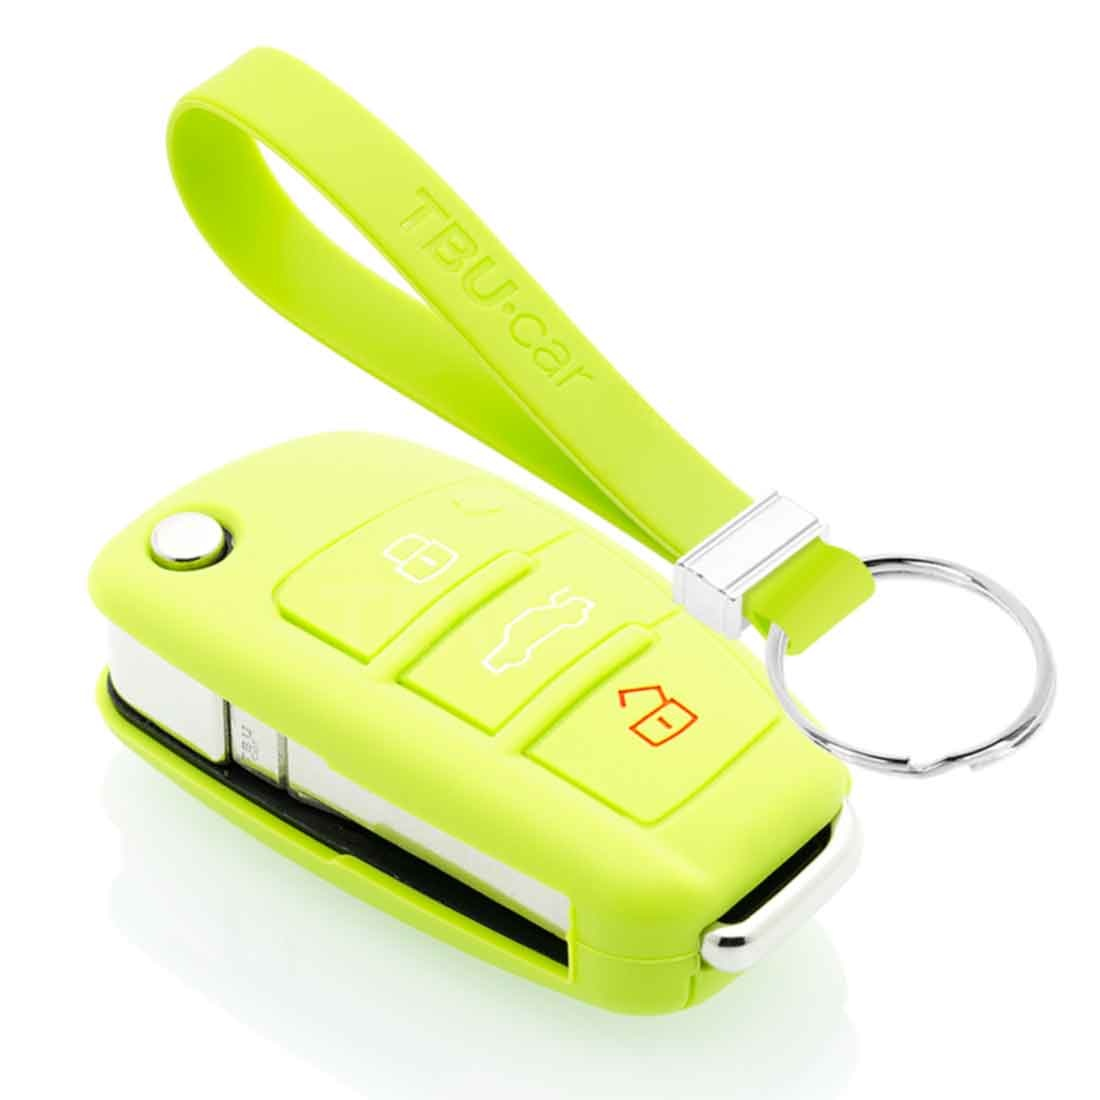 TBU car TBU car Funda Carcasa llave compatible con Audi - Funda de Silicona - Cover de Llave Coche - Verde lima